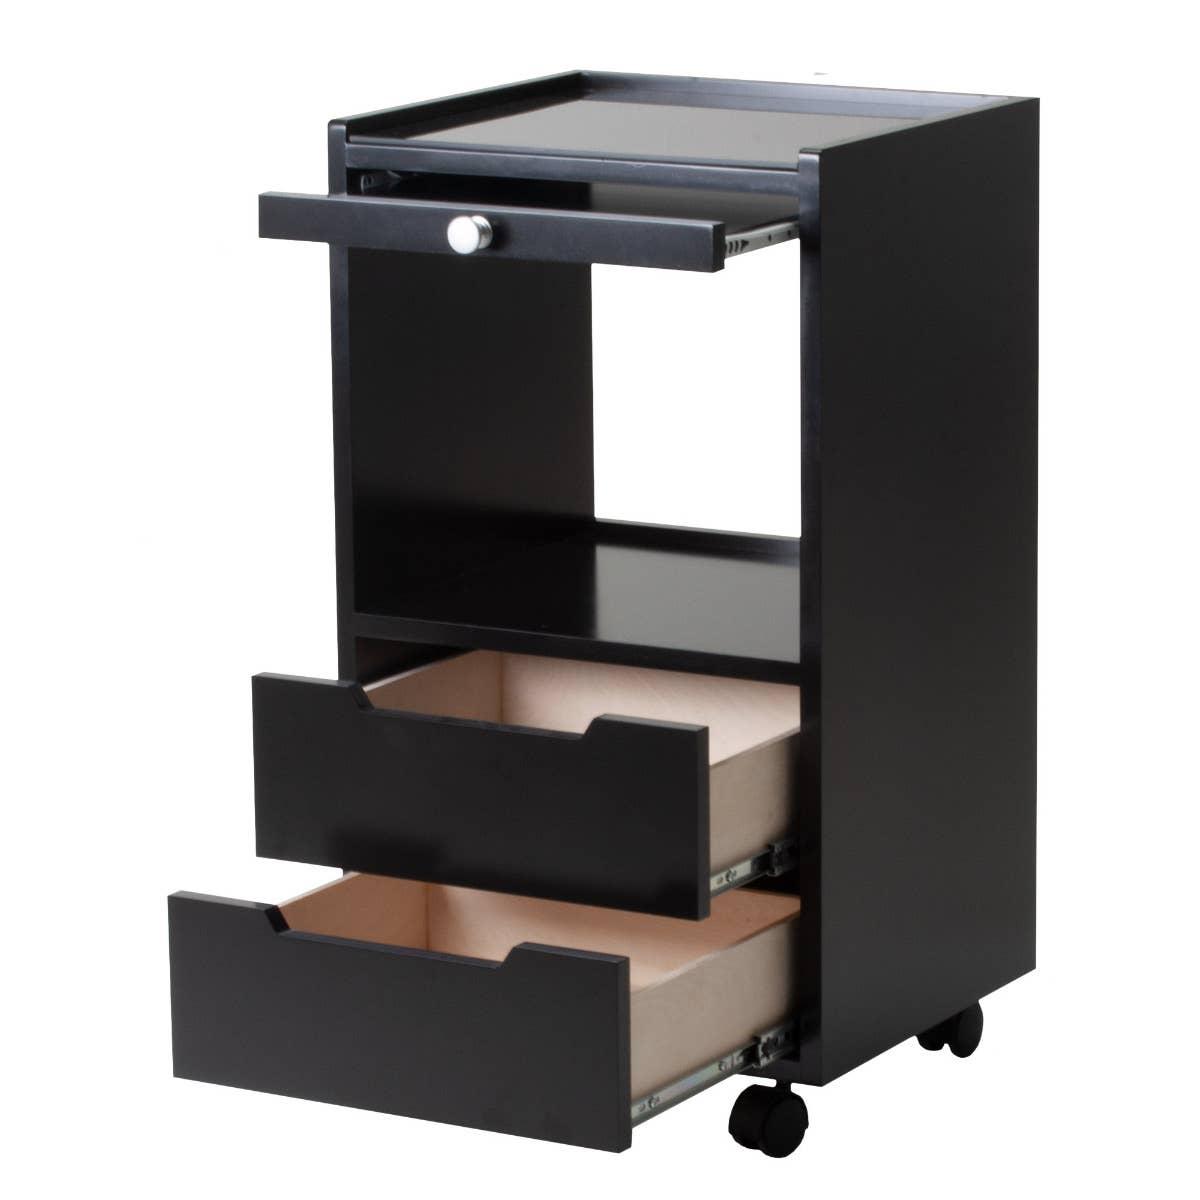 alpha_2_-_black_-_drawers_open_1